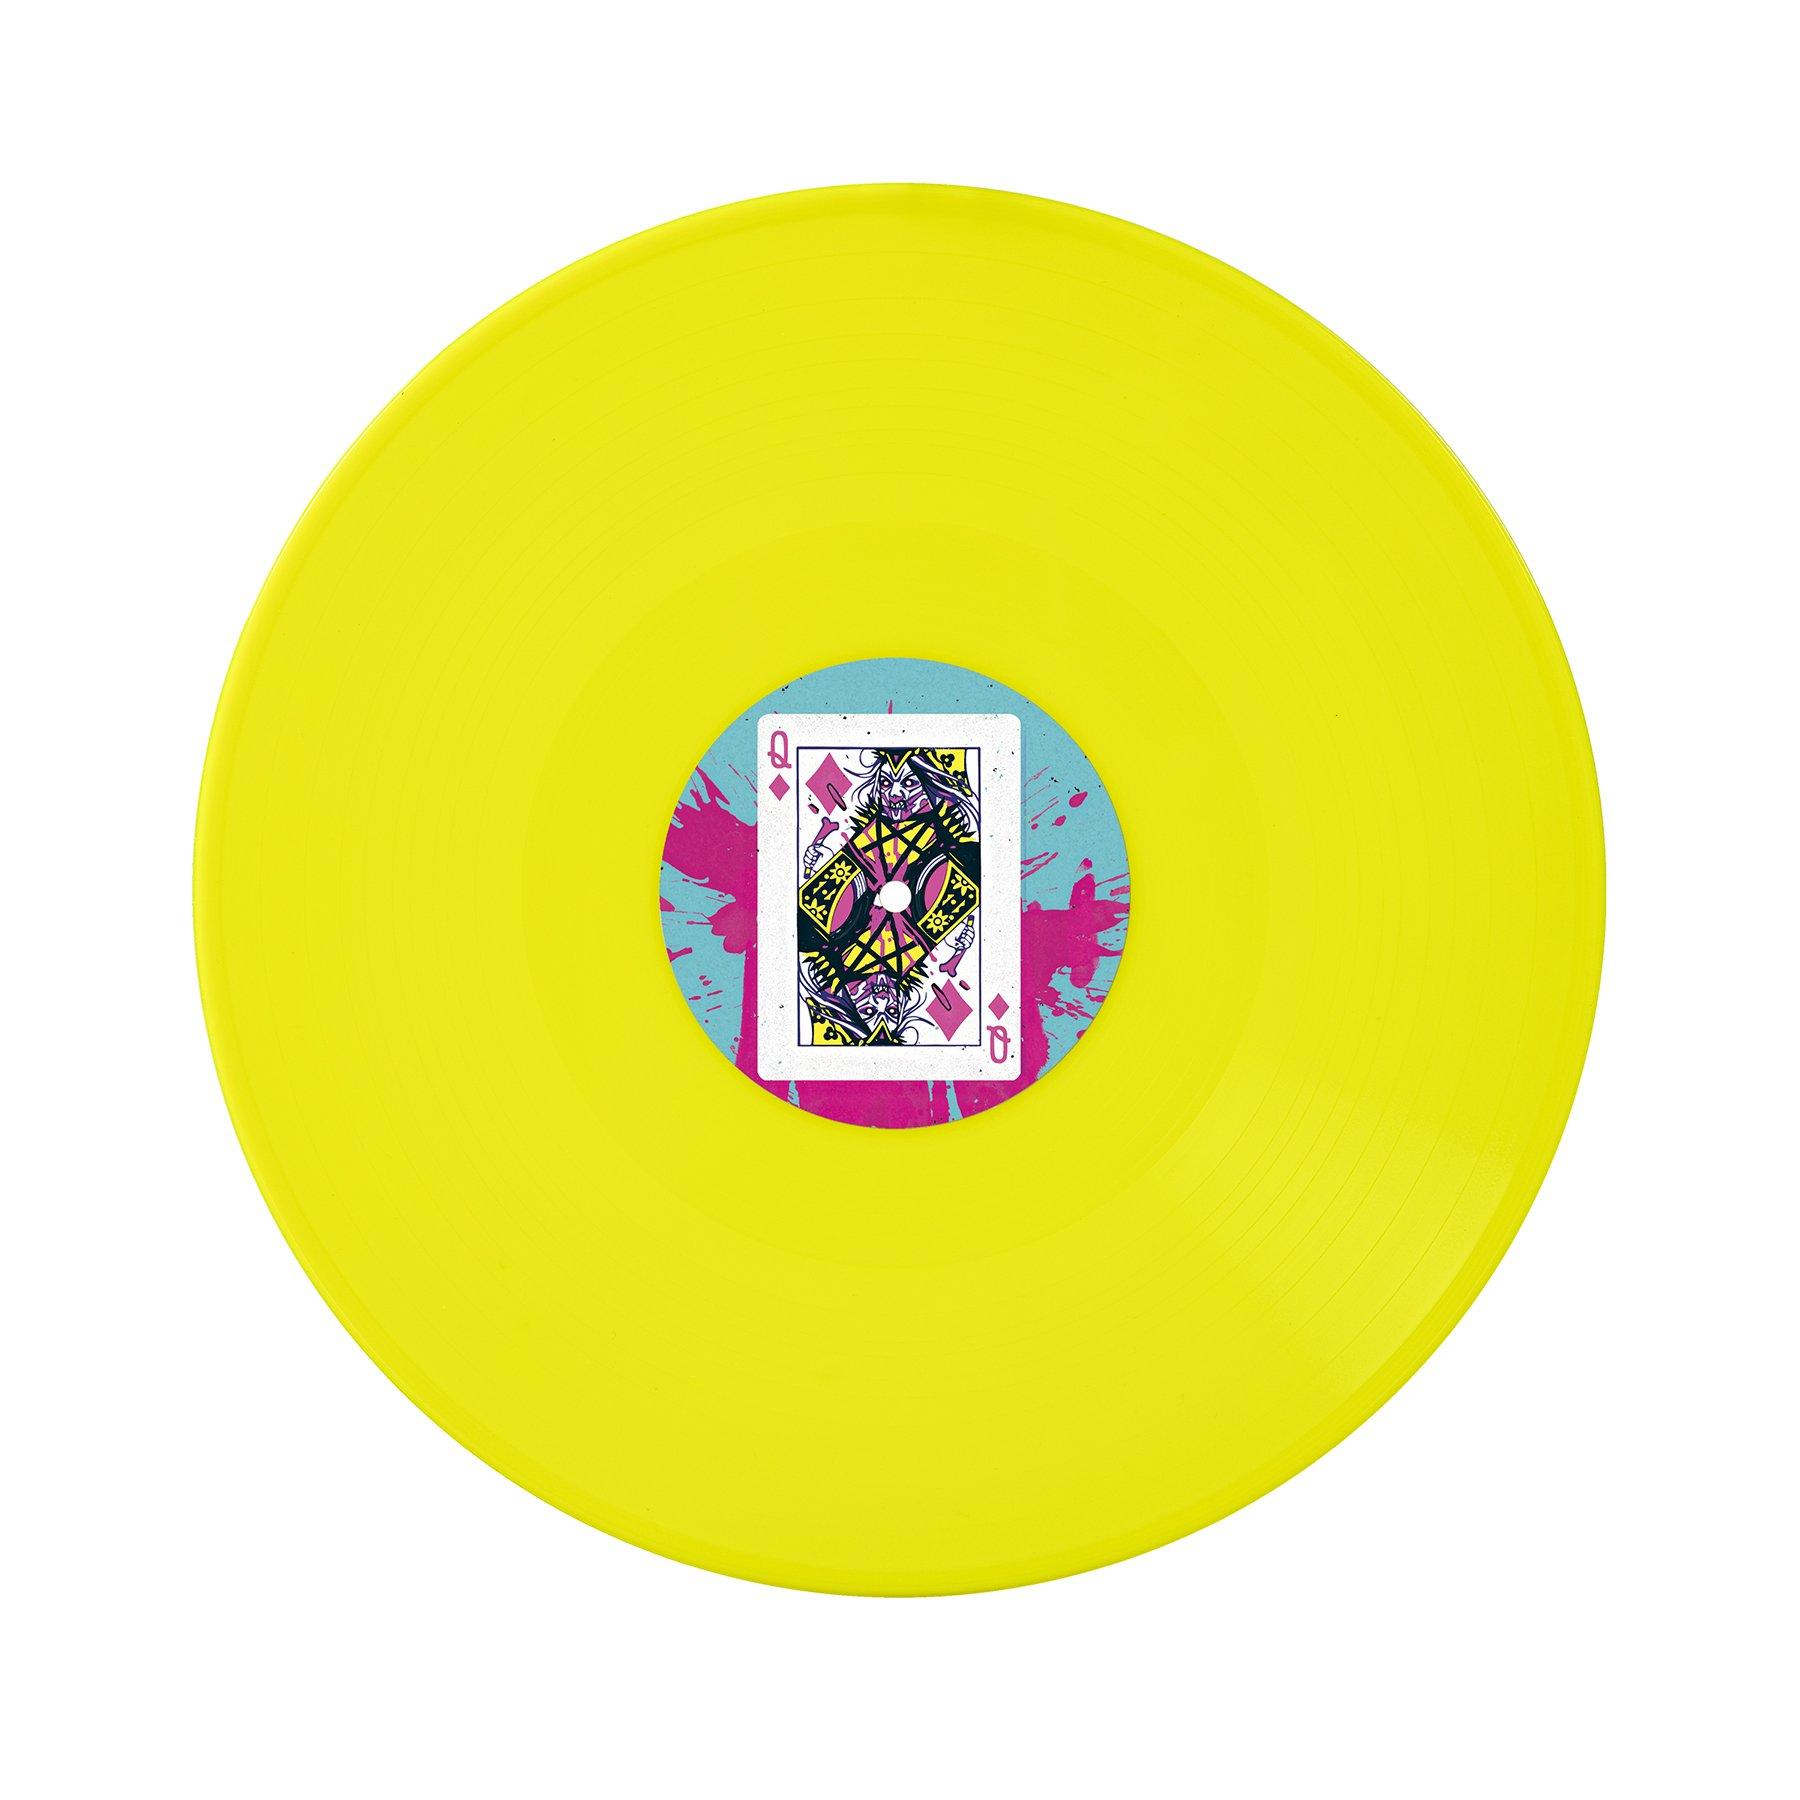 AOTD_CD_Vinyl_1800x1800_c4deae19-6539-40a0-89b4-fa20f9994508_1800x1800